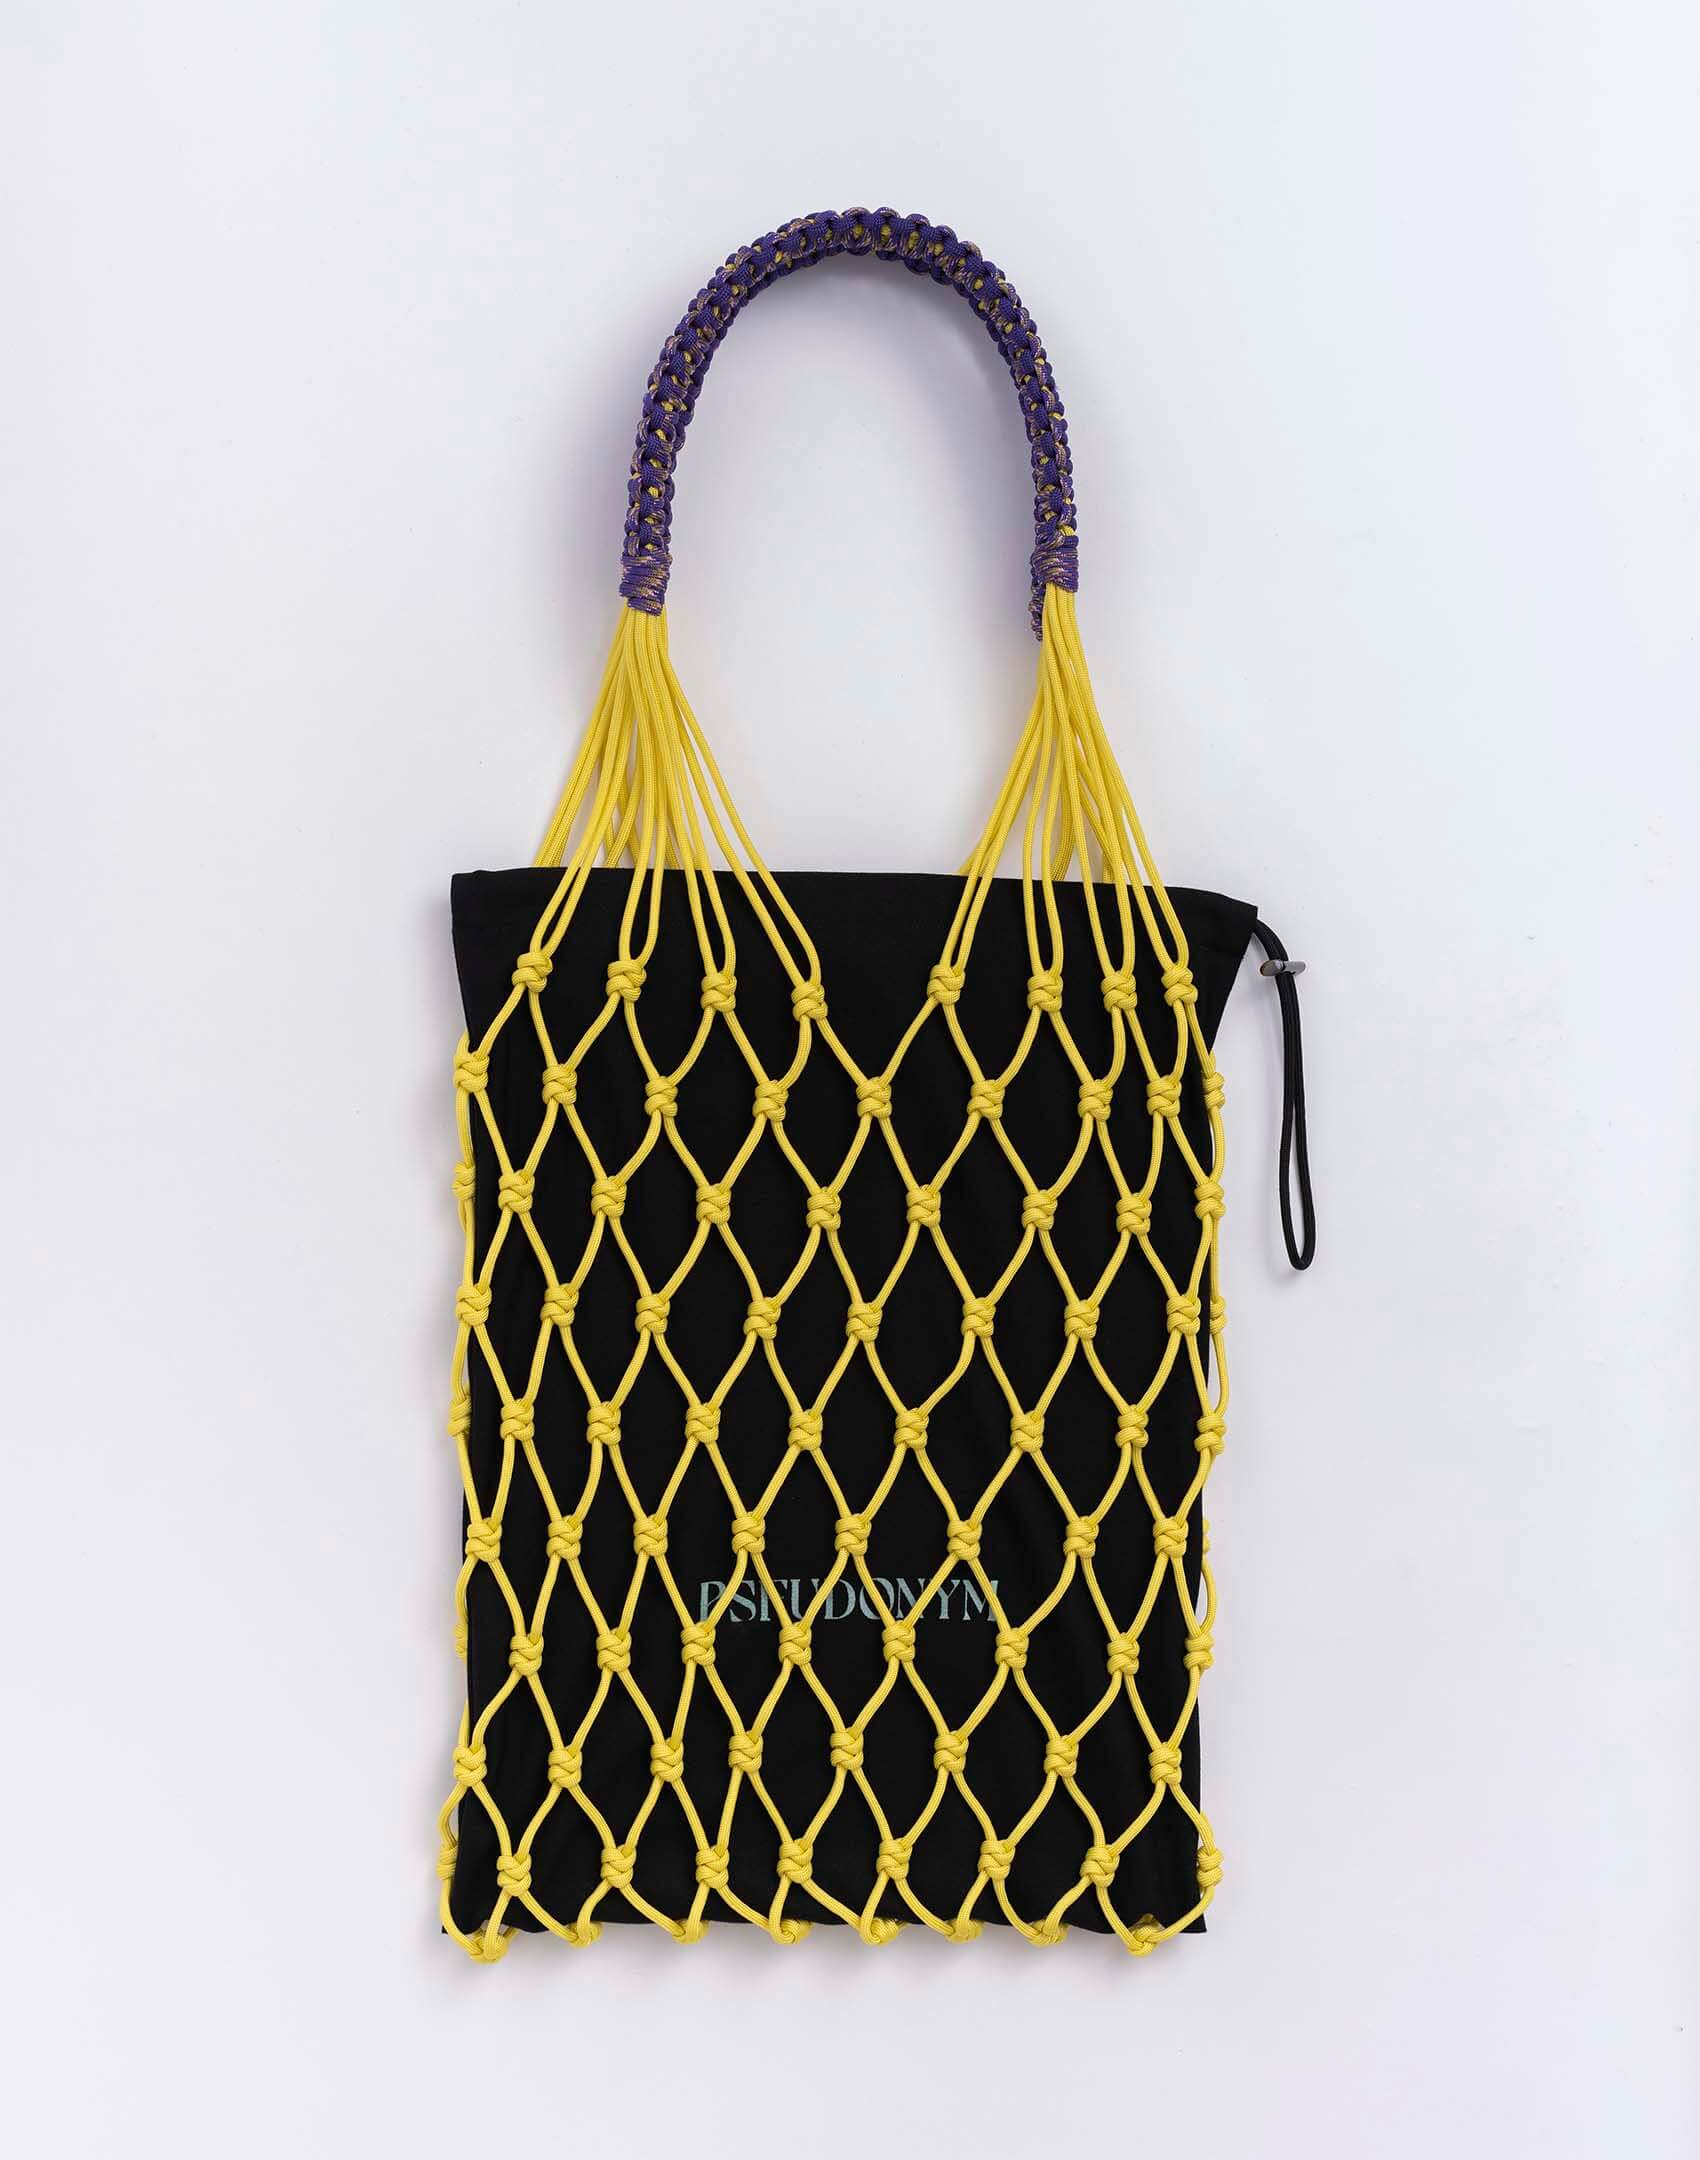 P.S. Field Bag 20 (Sakura), yellow/purple colorway.